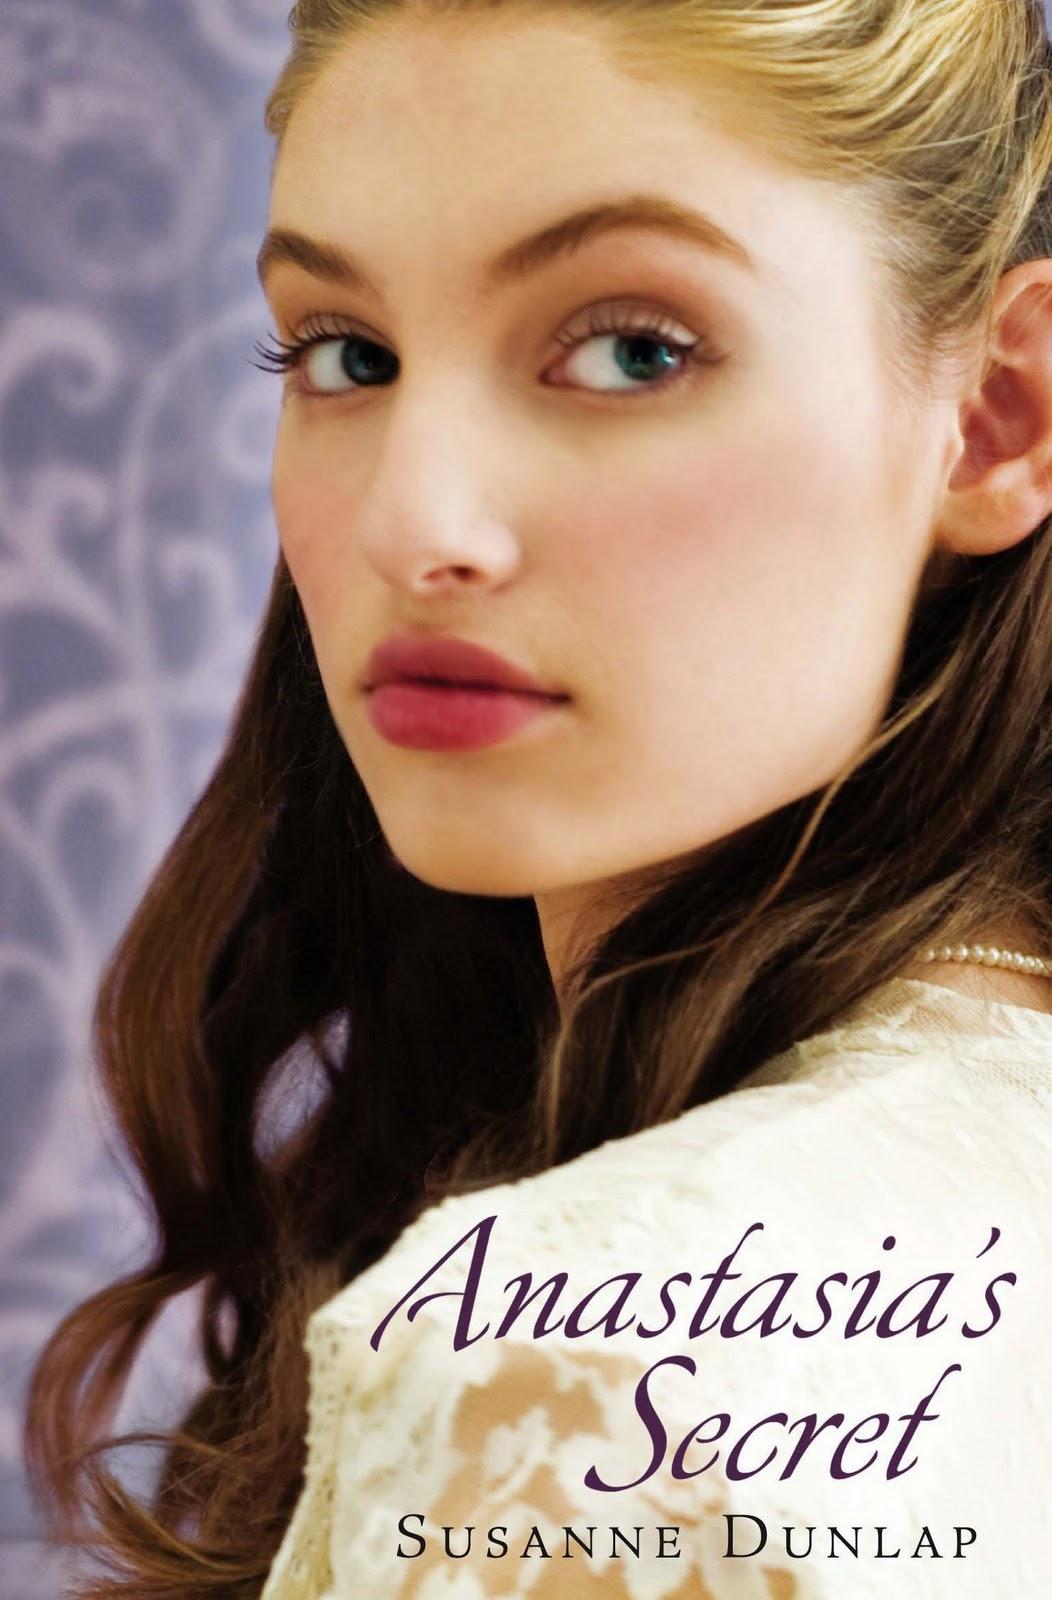 http://4.bp.blogspot.com/_DR9o7xaEXns/TUrL19Y6DGI/AAAAAAAACOM/EBVpBdwbYEo/s1600/anastasiassecret.jpg